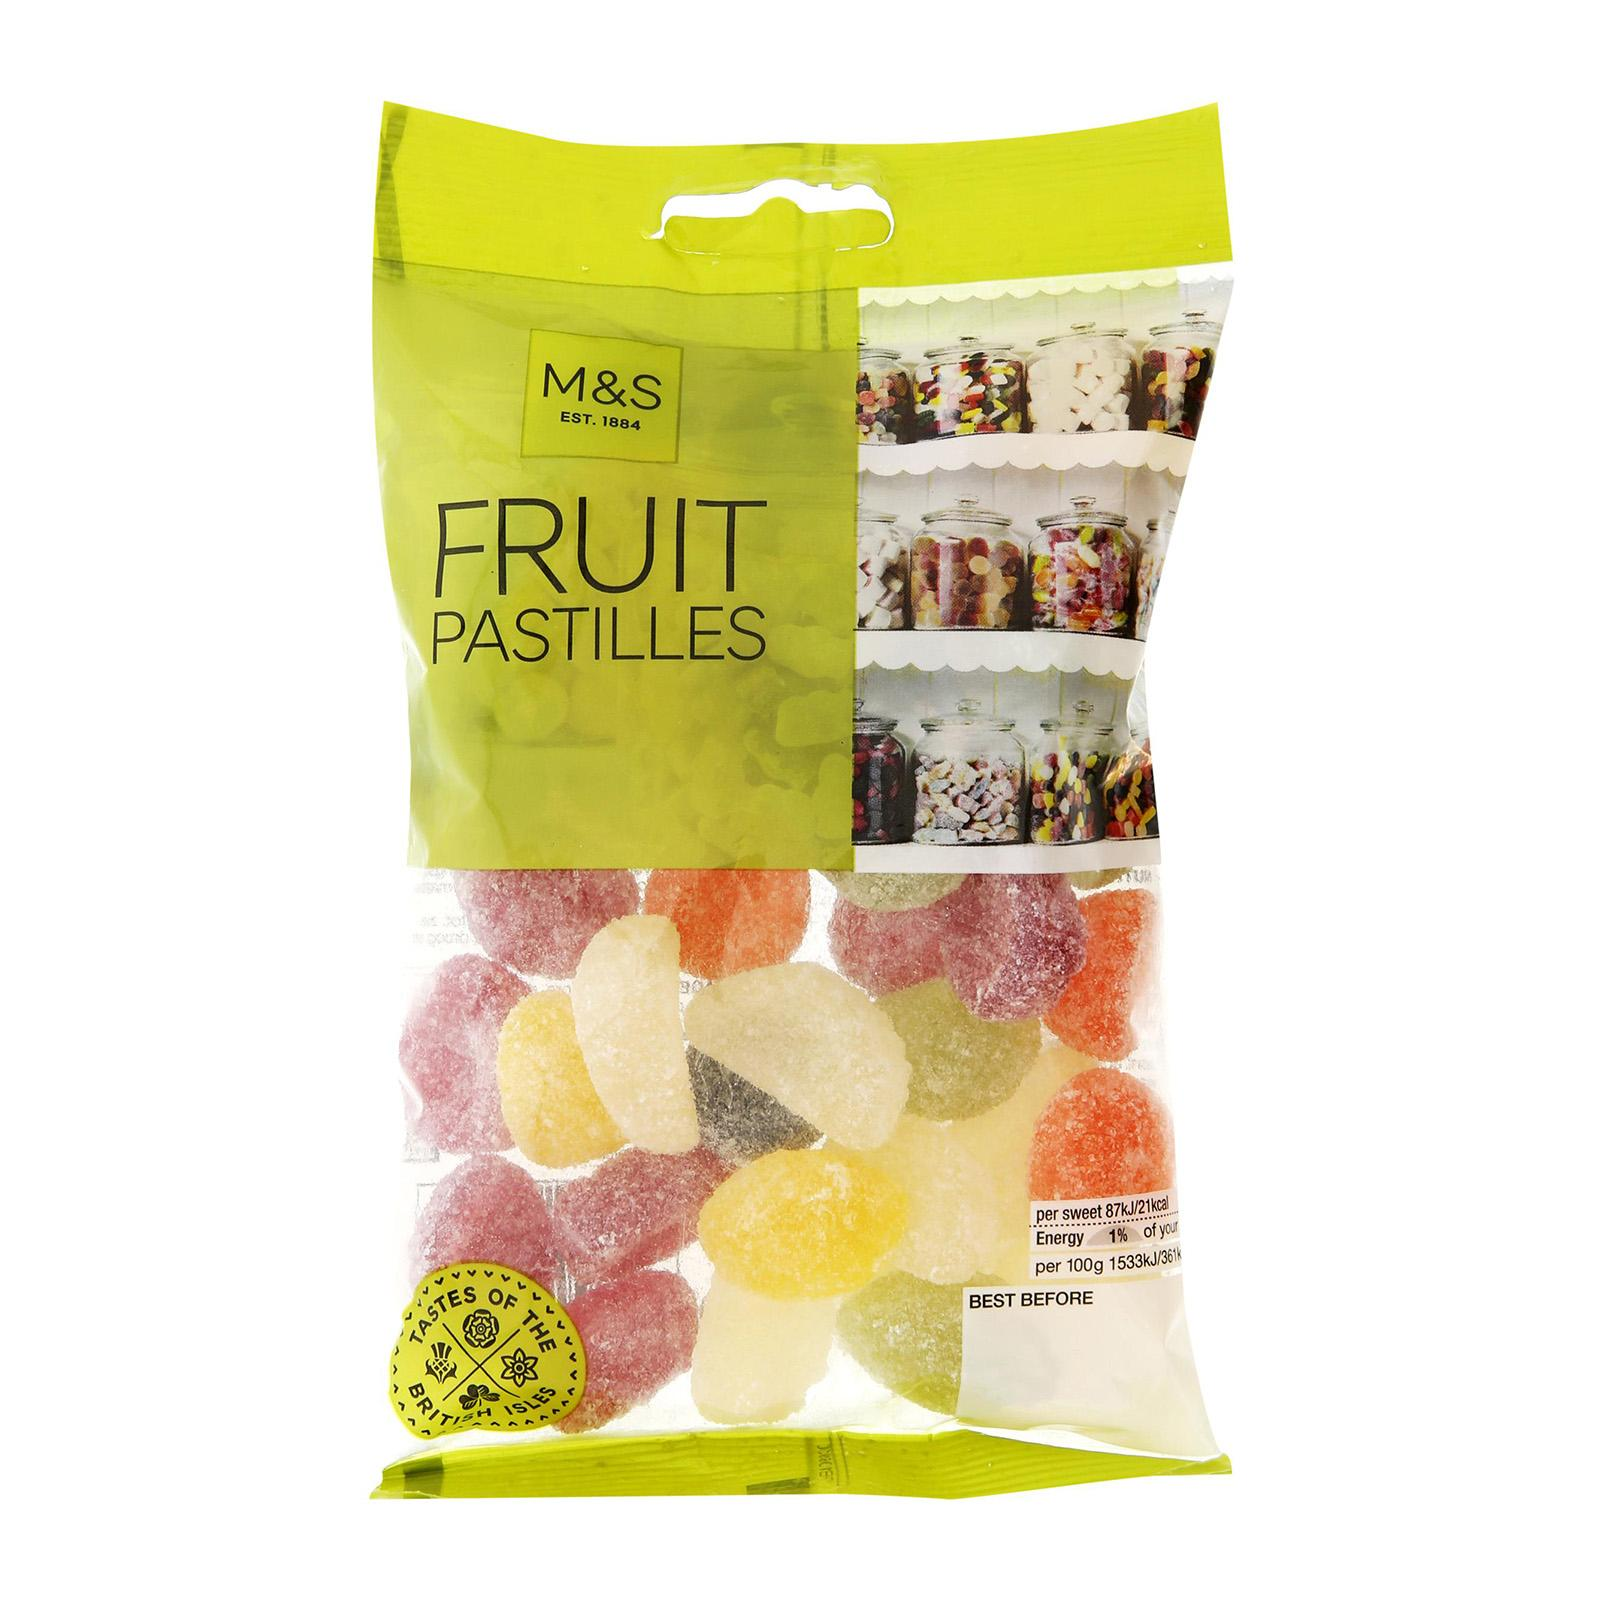 Marks & Spencer Fruit Pastilles